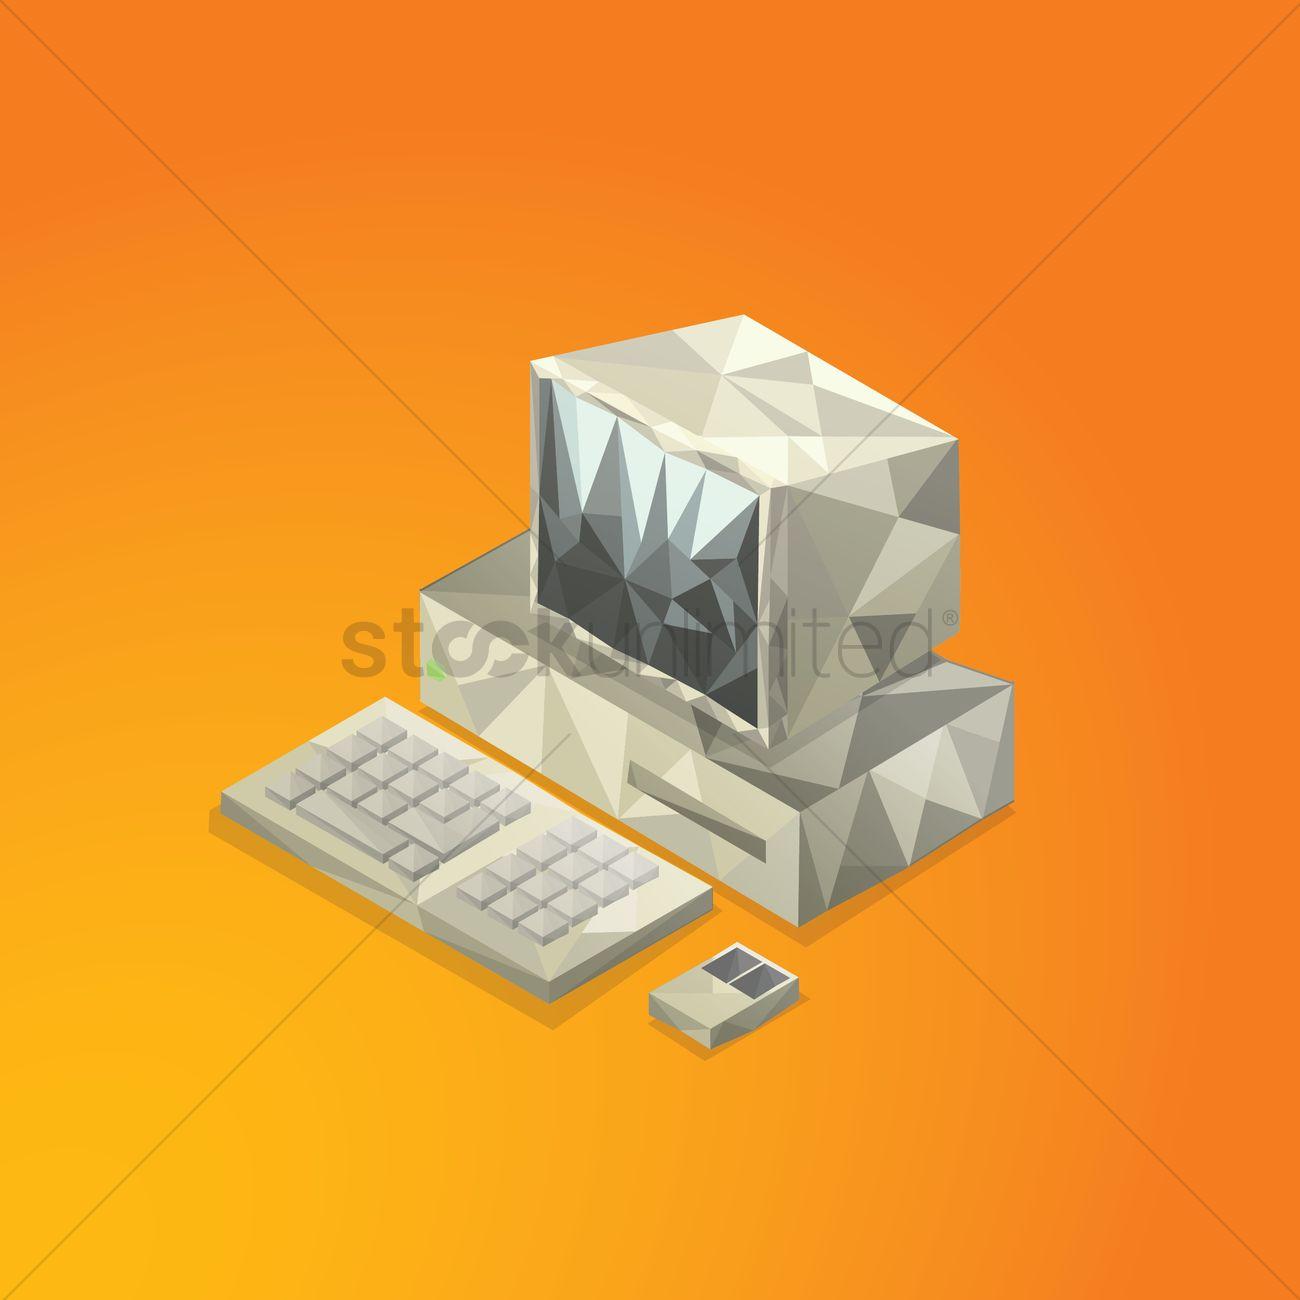 Retro computer Vector Image - 1544649 | StockUnlimited